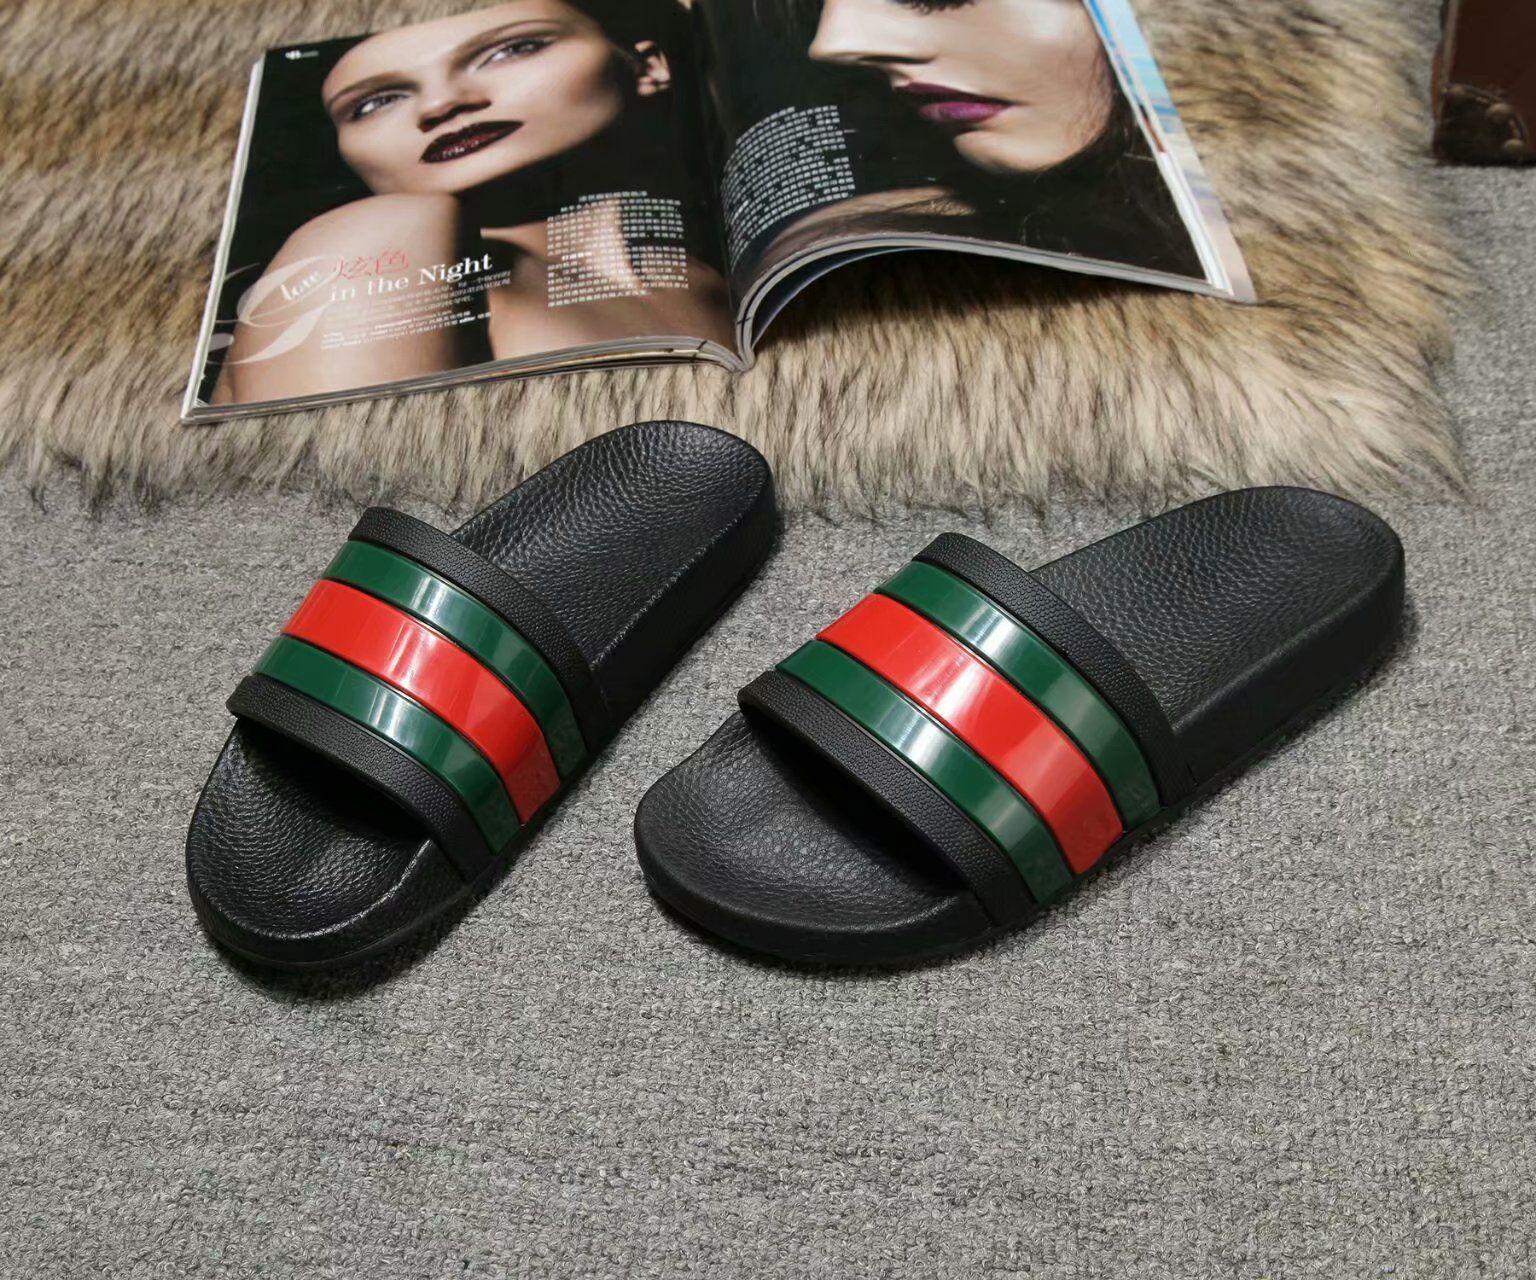 bb1449cd0 Hot Sale Brand Men Beach Slide Red Green Sandals 2019 Summer Outdoor  Slippers Mens Summer Beach Fashion Slip On Designer Sandals Slide Strip  Wedge Sneakers ...